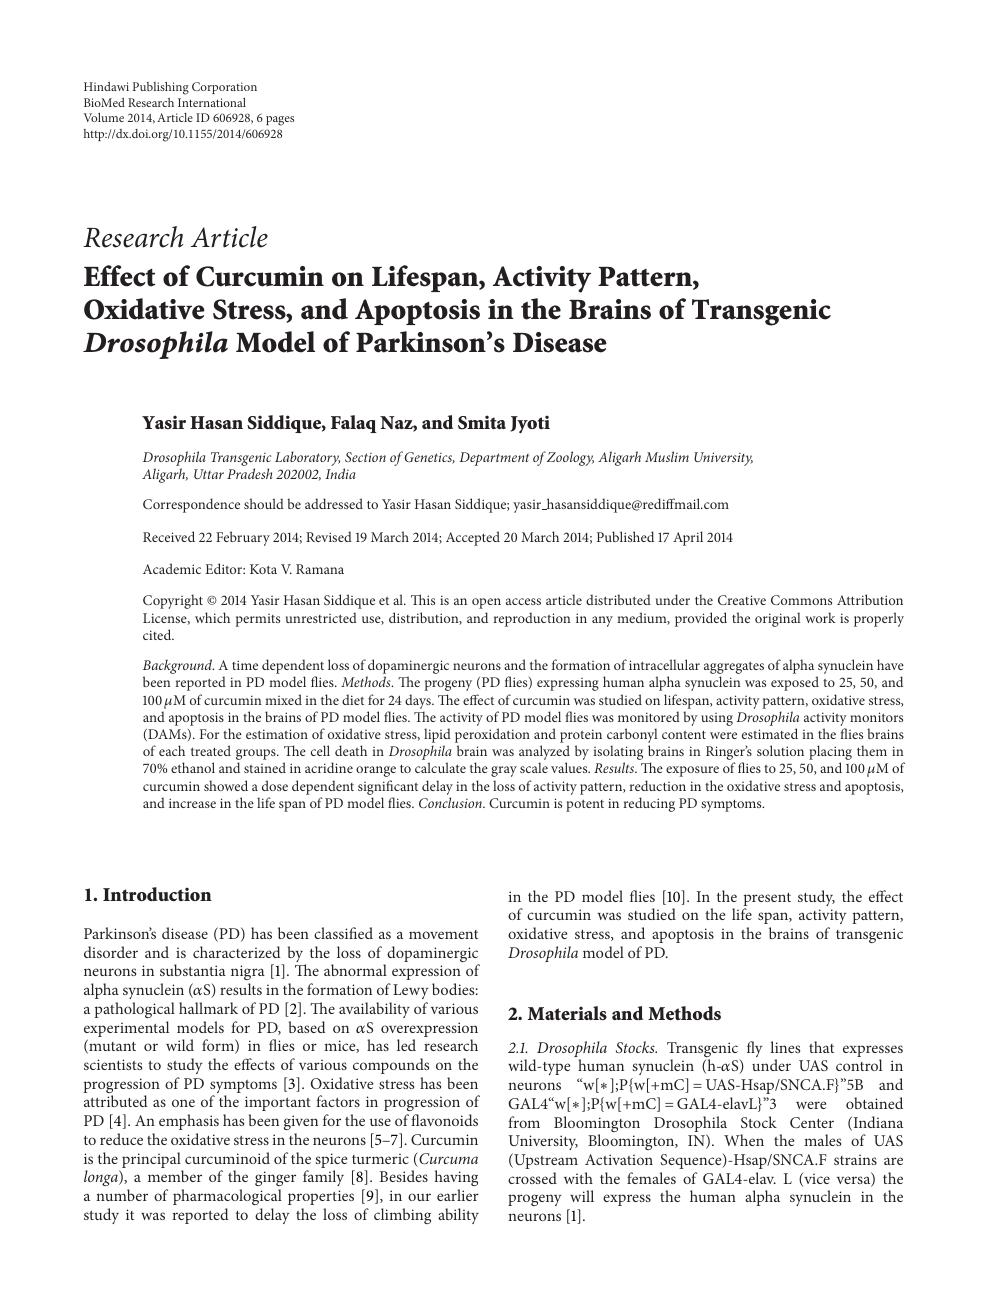 Effect of Curcumin on Lifespan, Activity Pattern, Oxidative